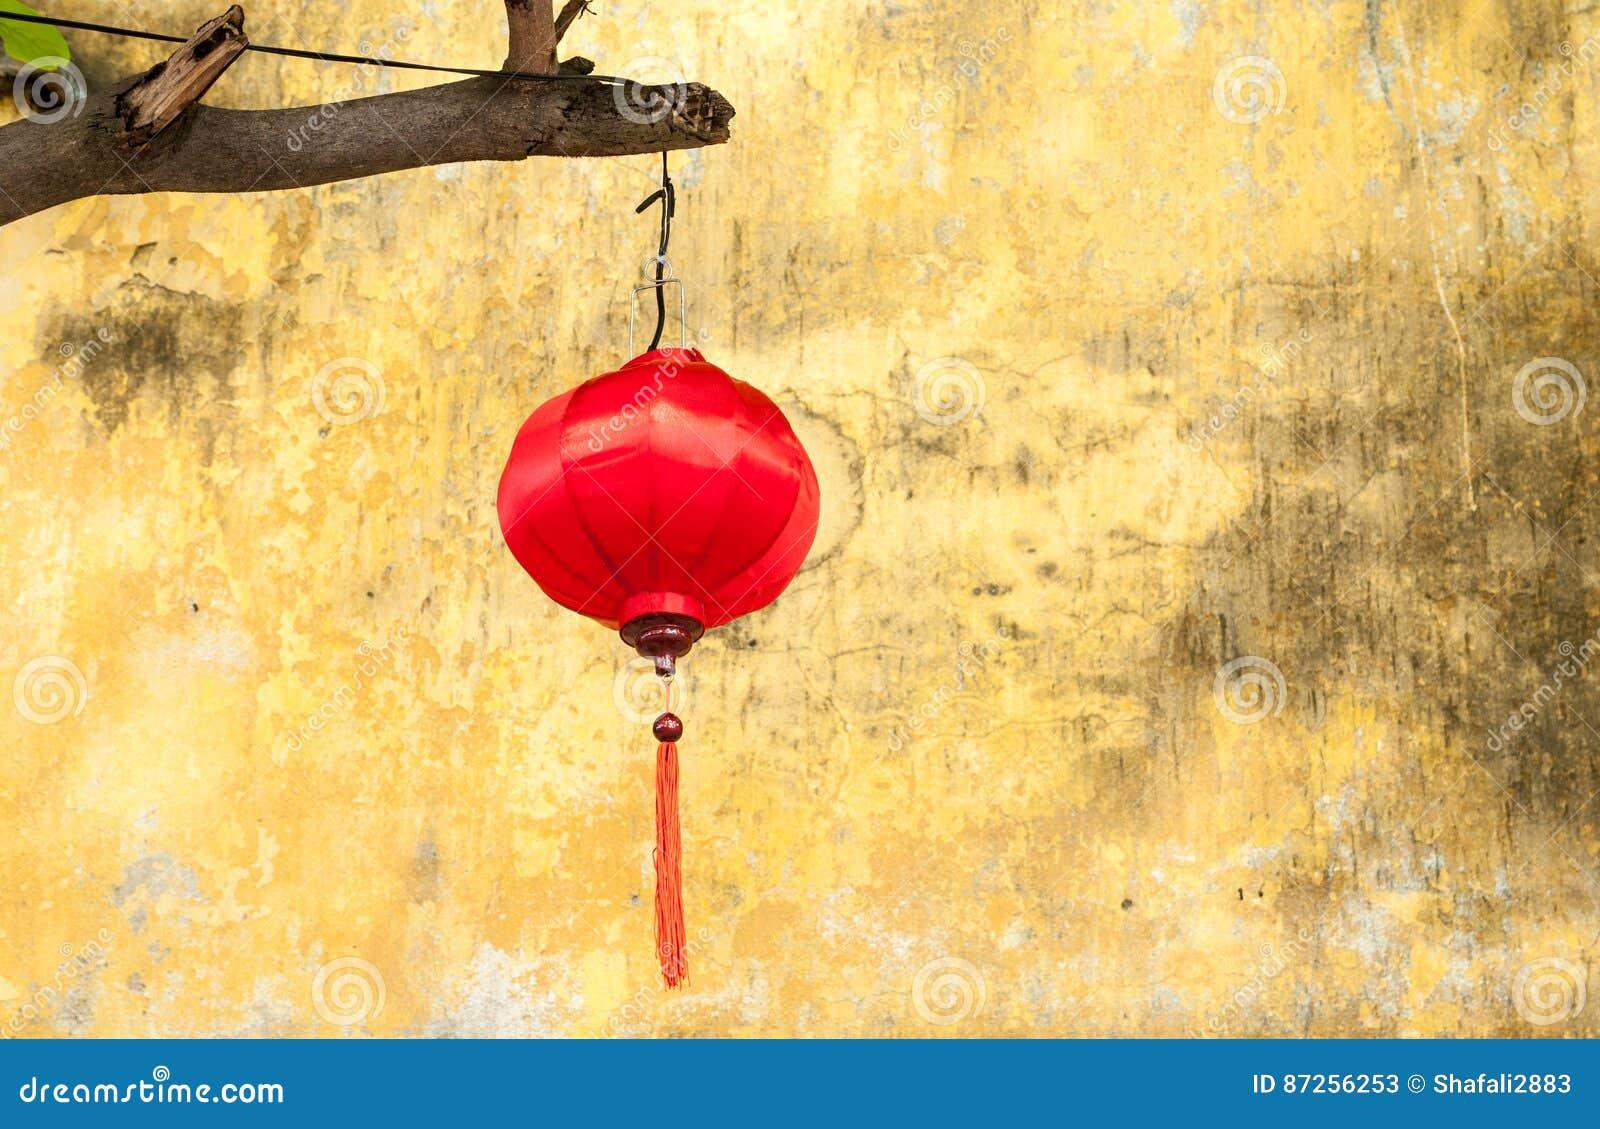 Vietnamese Red Silk Lantern Stock Image - Image of silk, chinese ...